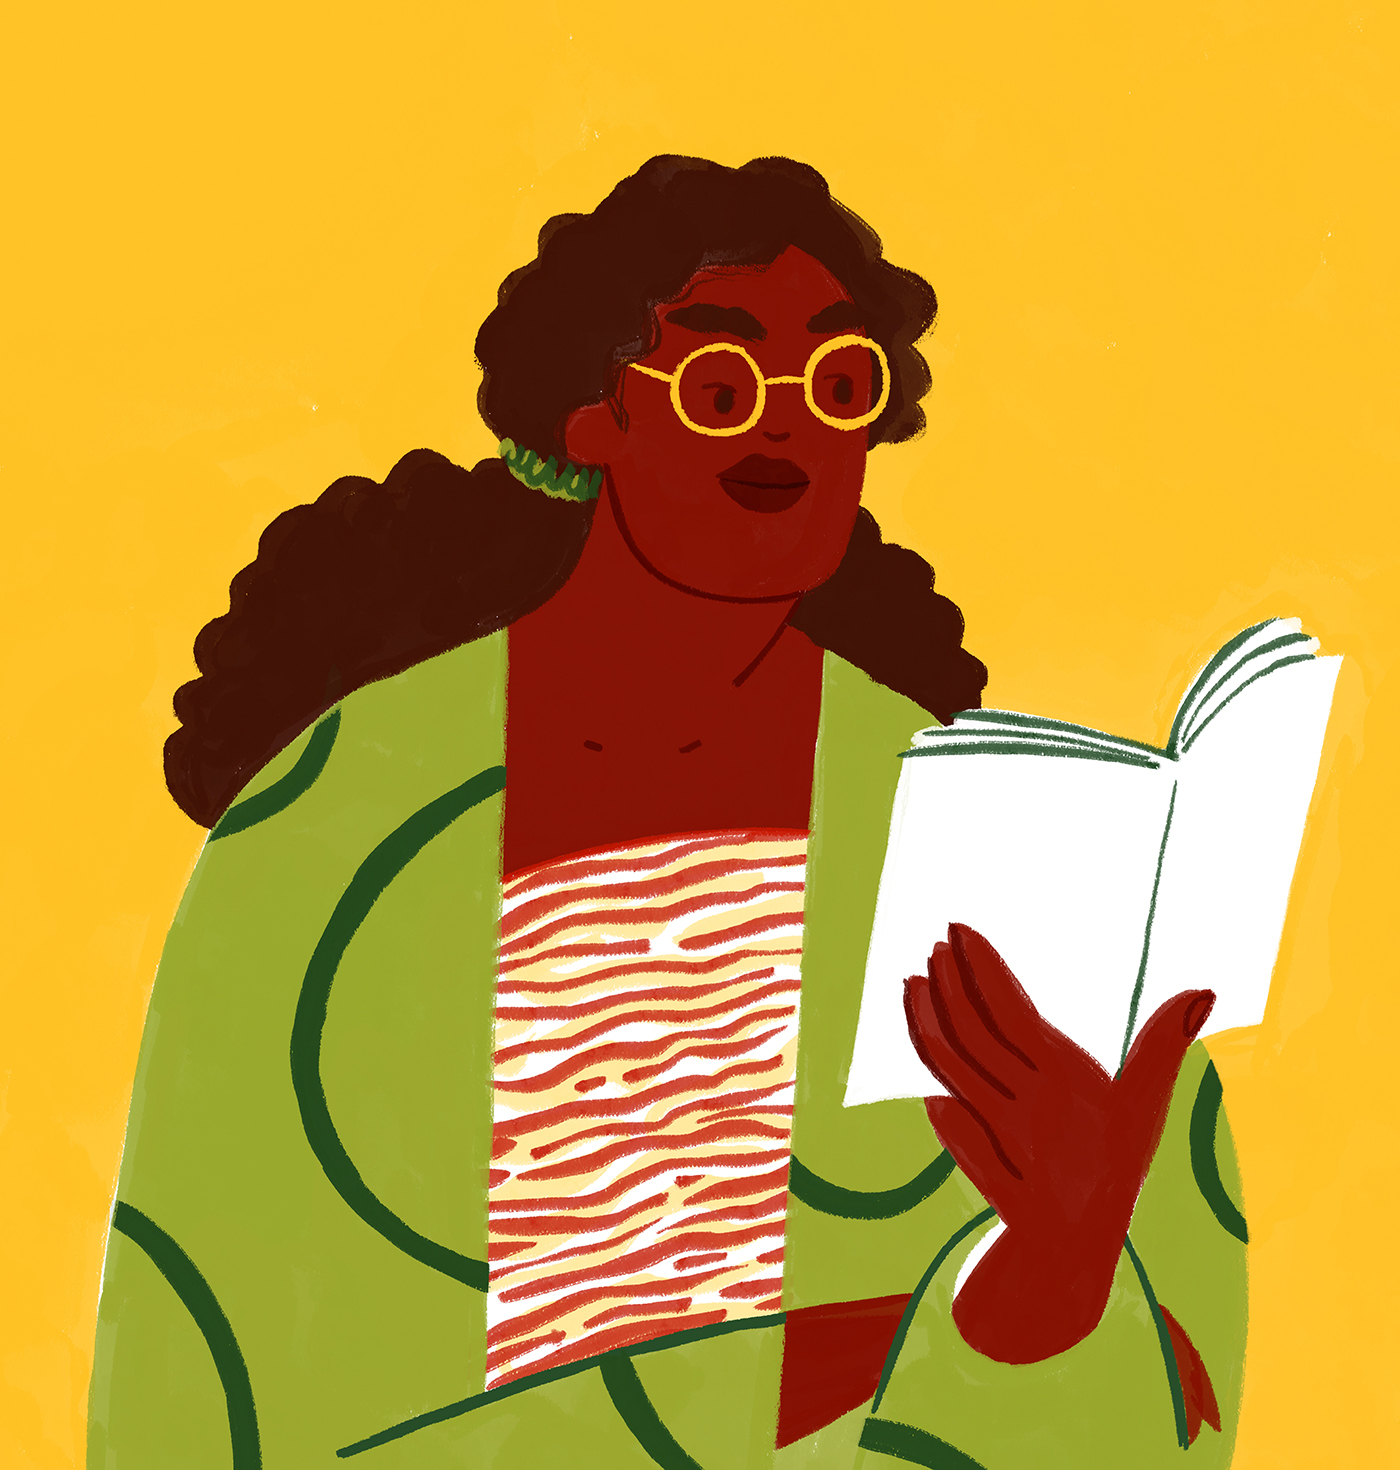 reading-woman-portrait-natural-hair-pattern-illustration-violeta-noy